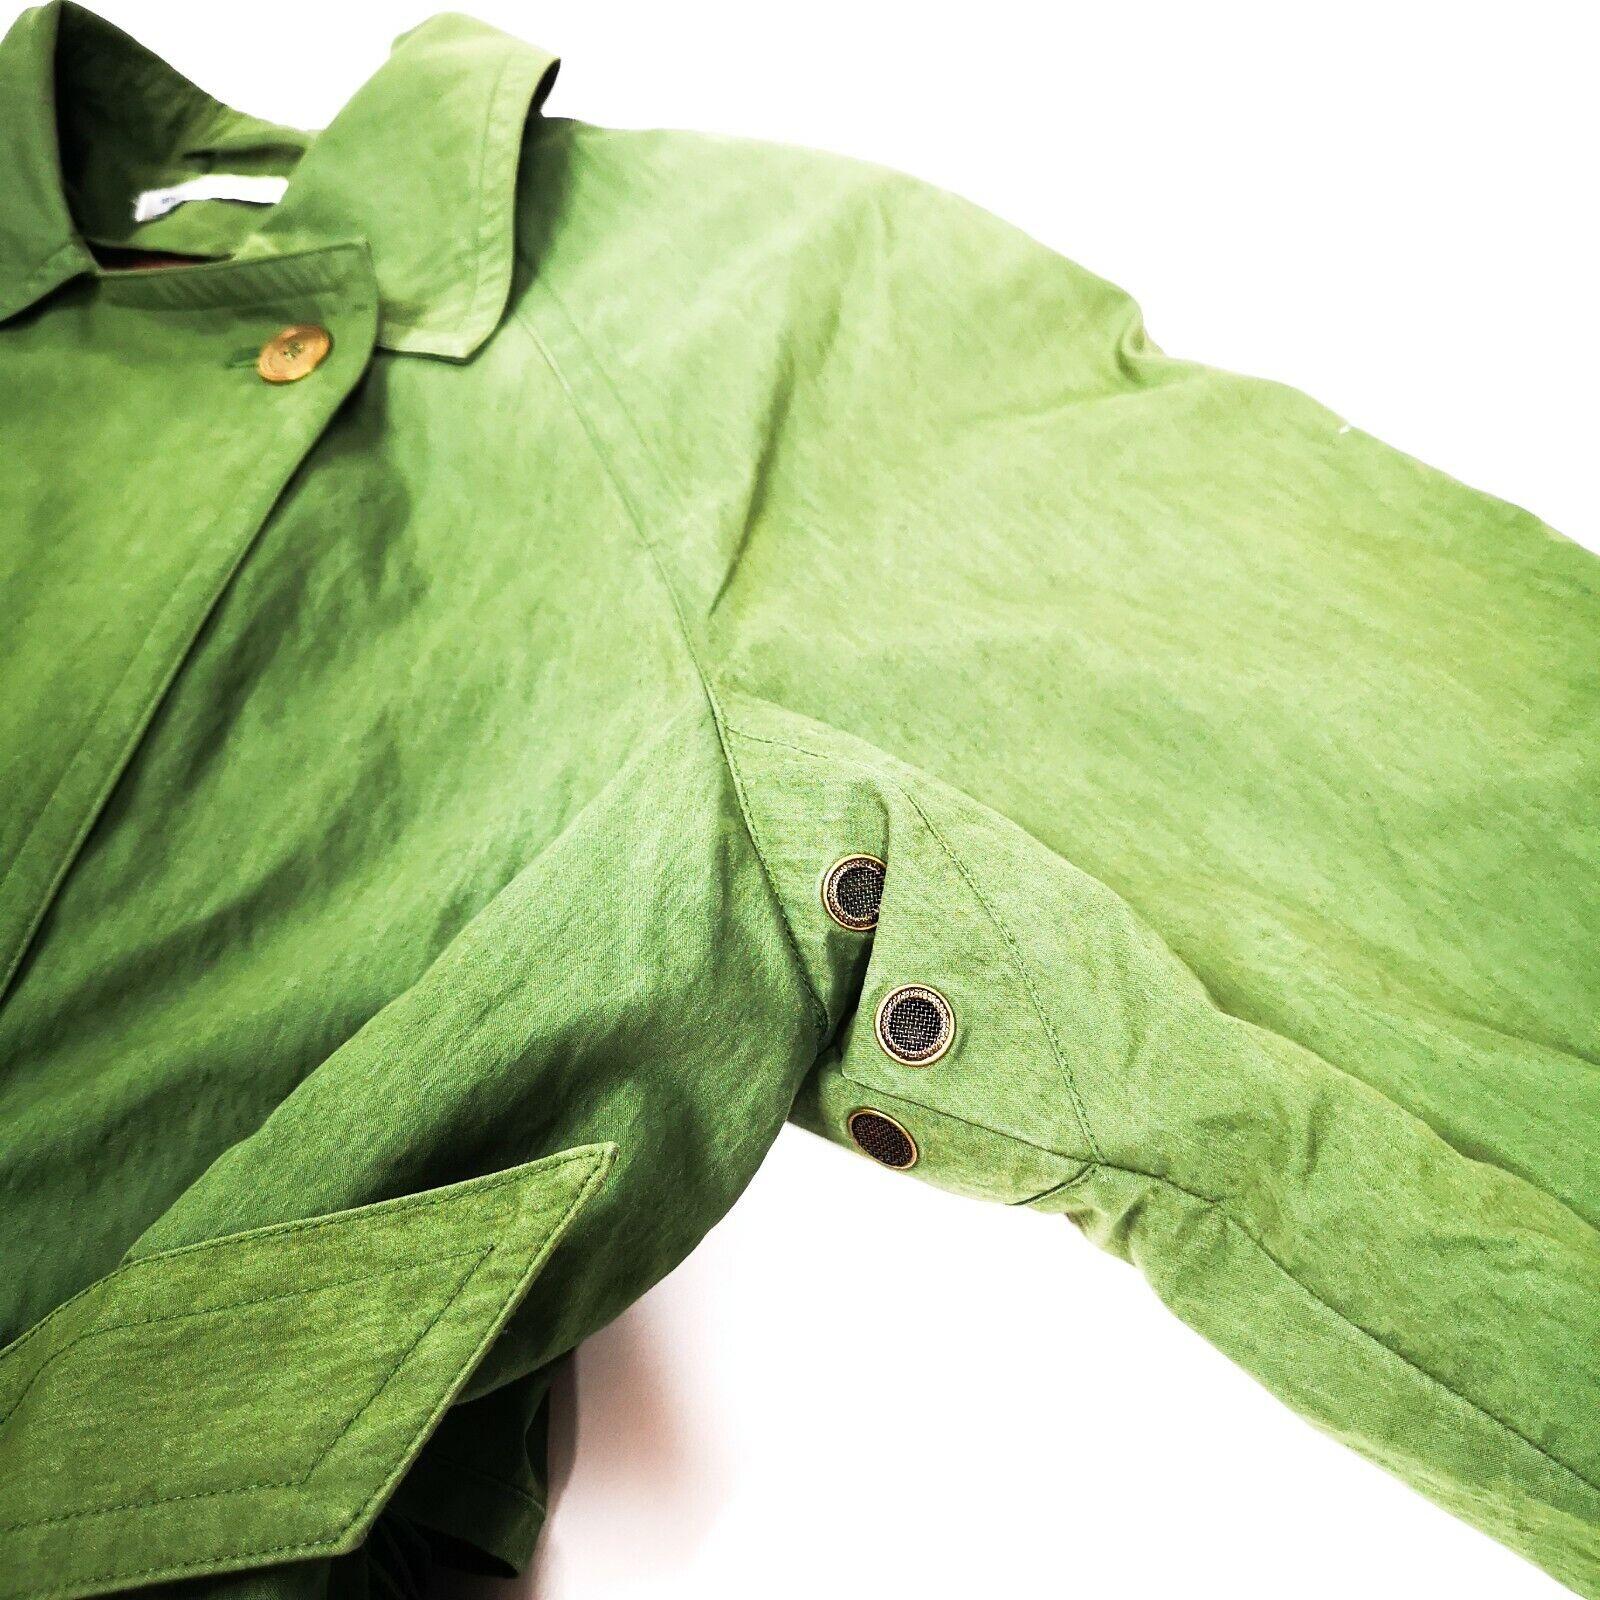 MISTY HARBOR Trench Coat Jacket 8 Olive Green - image 6